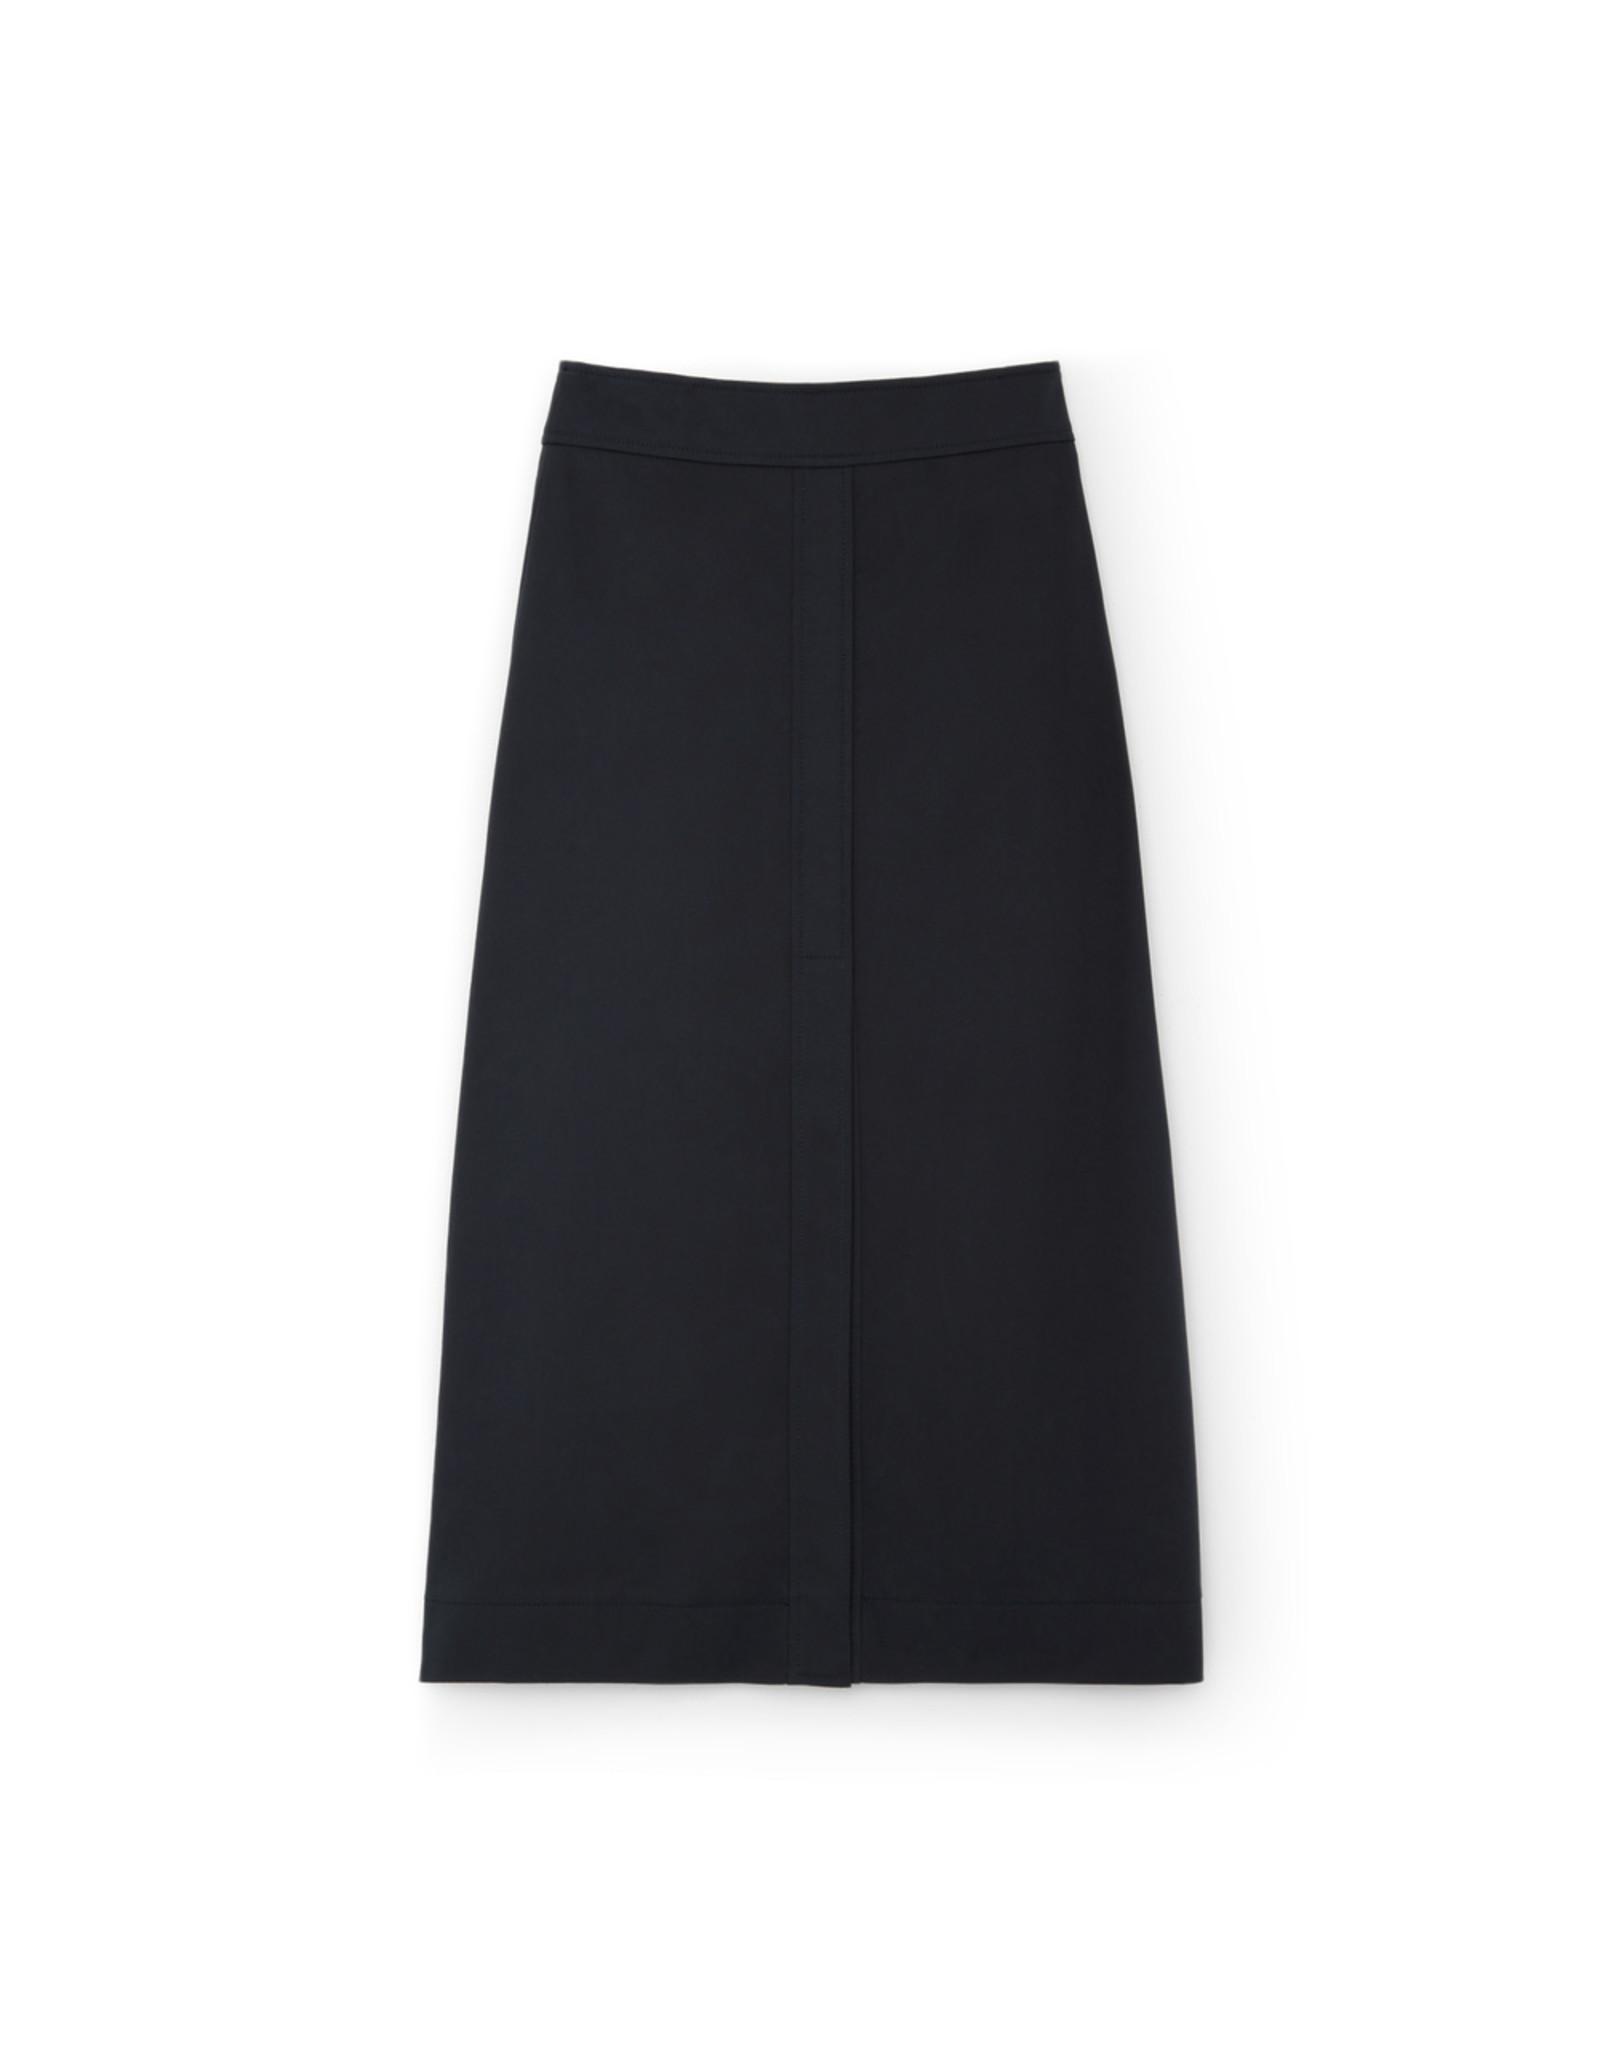 G. Label G. Label Stewart A-Line Cotton Skirt (Color: Navy, Size: 2)